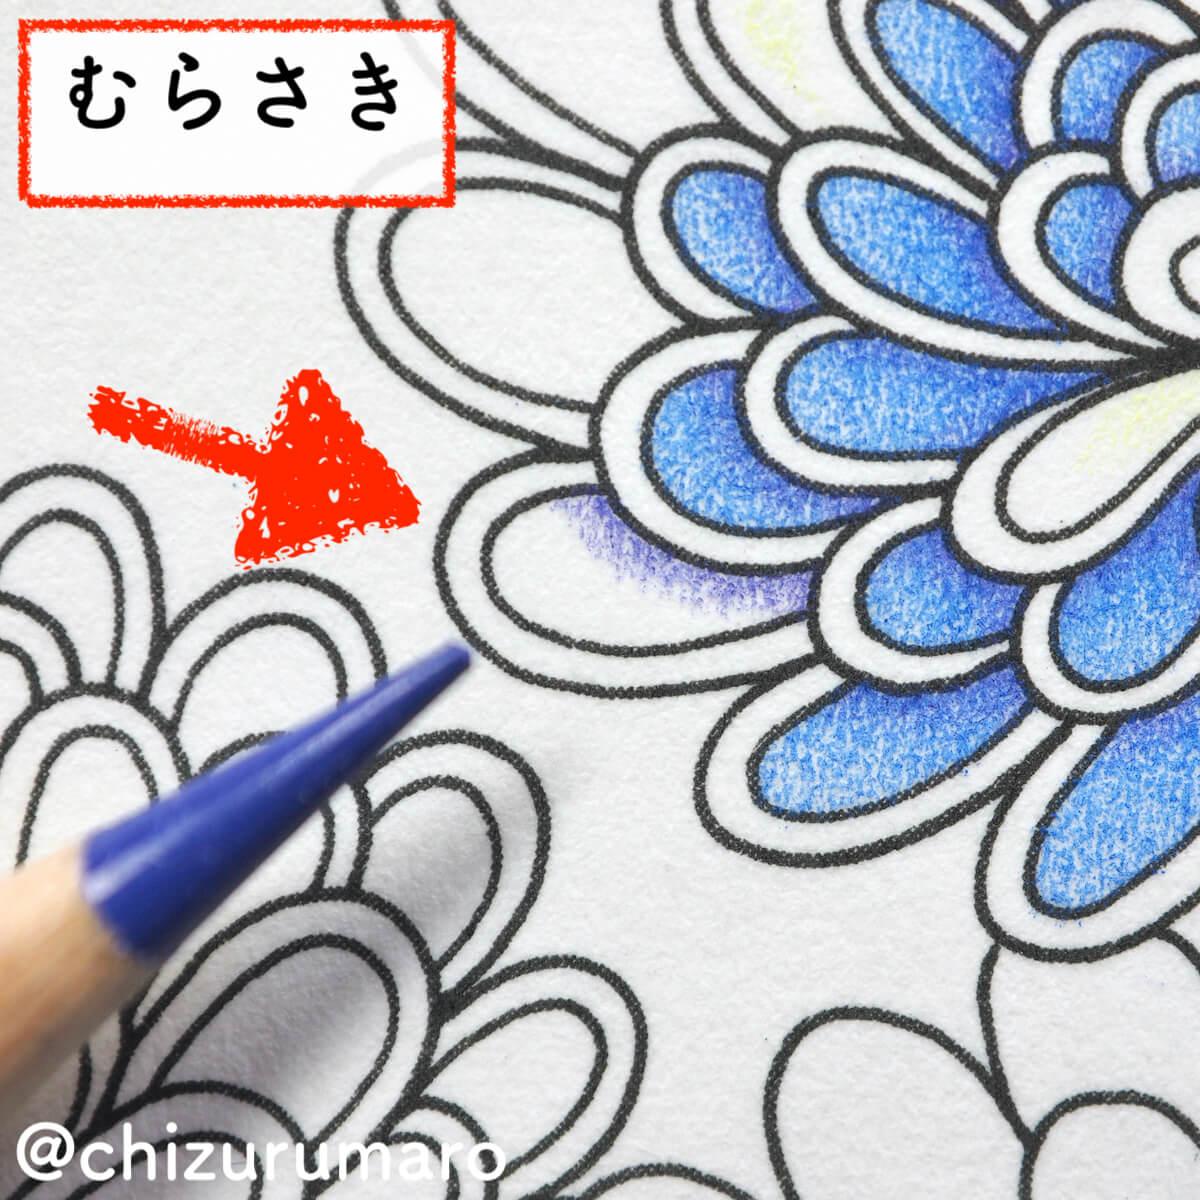 f:id:chizurumaro:20200404105832j:plain